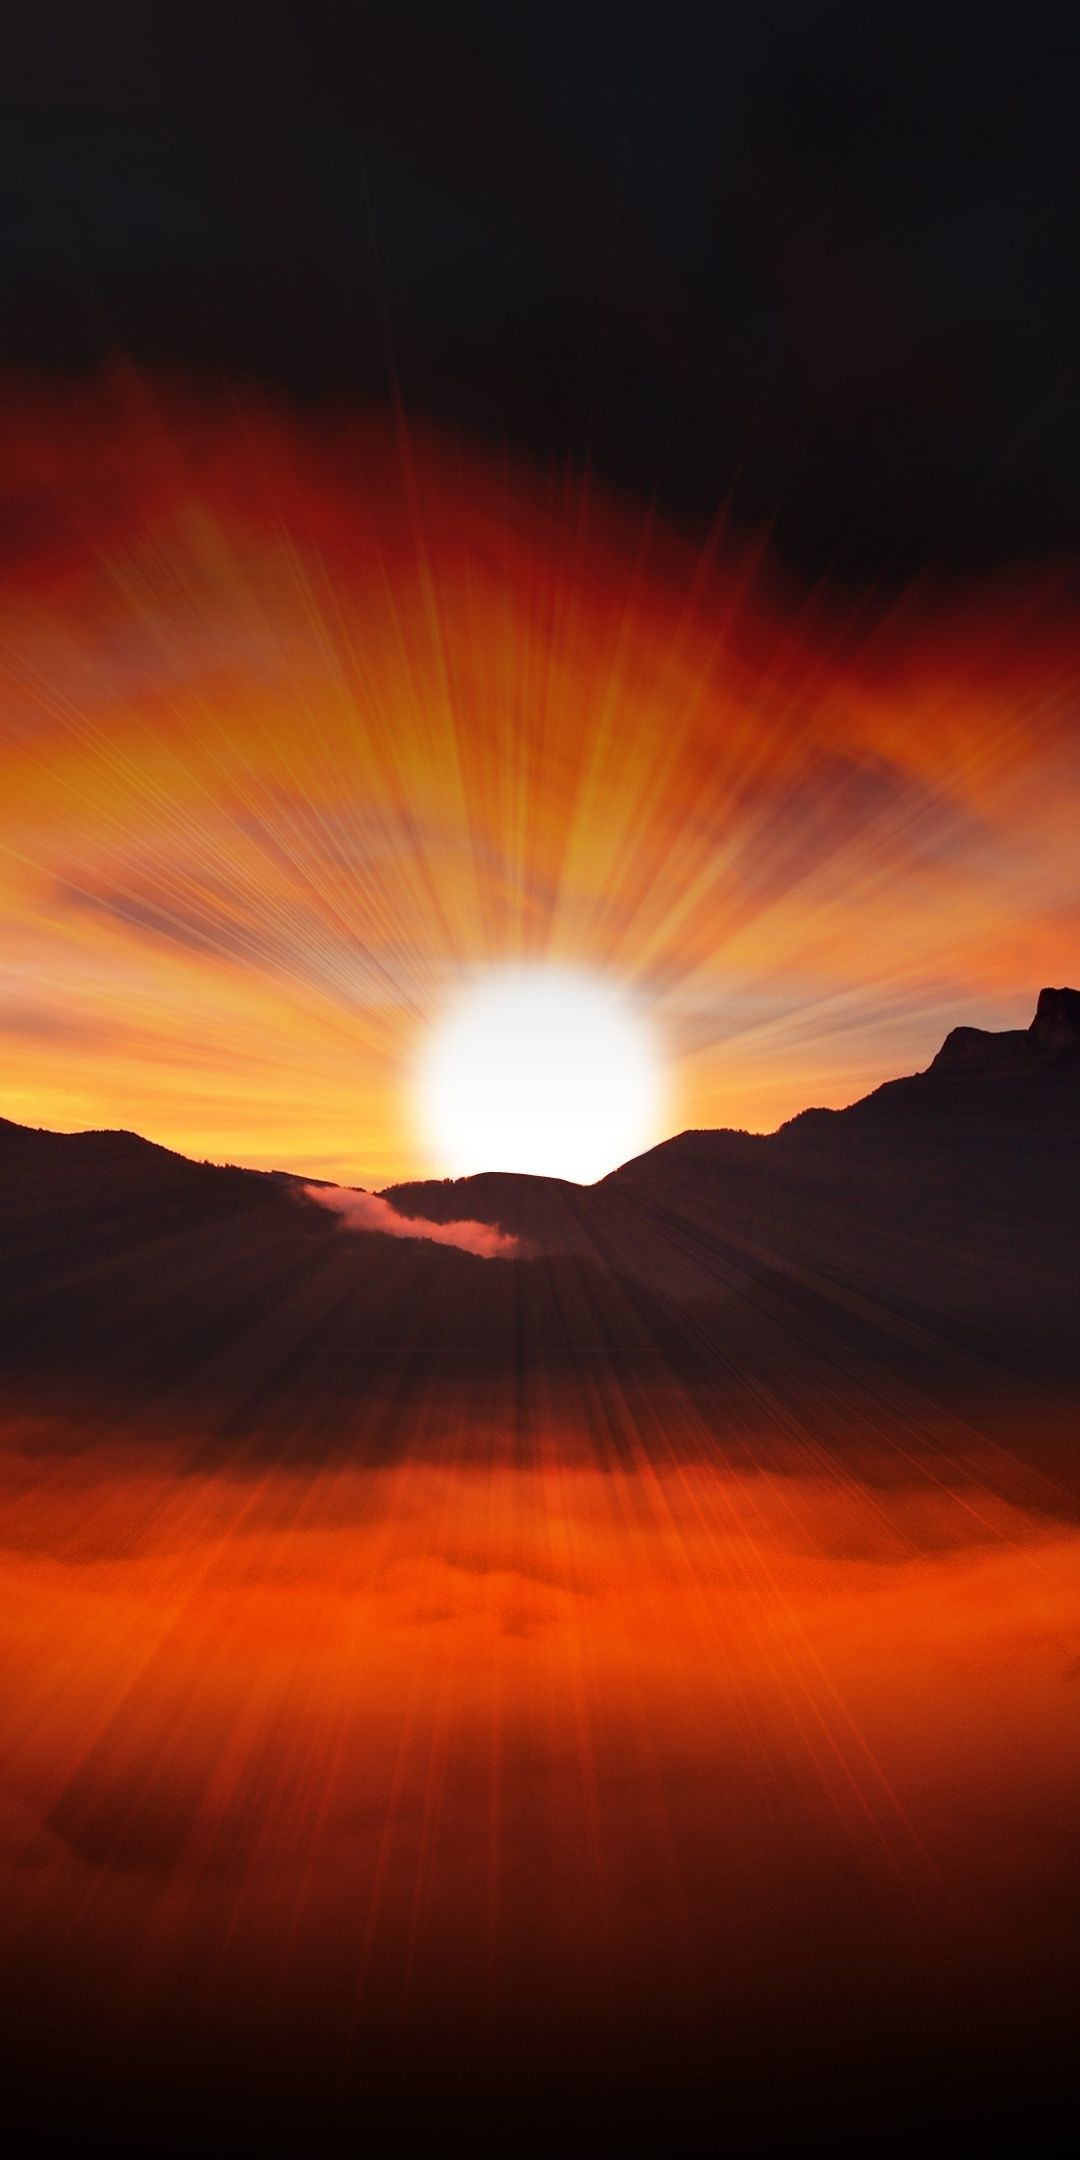 Sunset Landscape Silhouette Mountains 1080x2160 Wallpaper Landscape Silhouette Sunset Landscape Sunrise Wallpaper